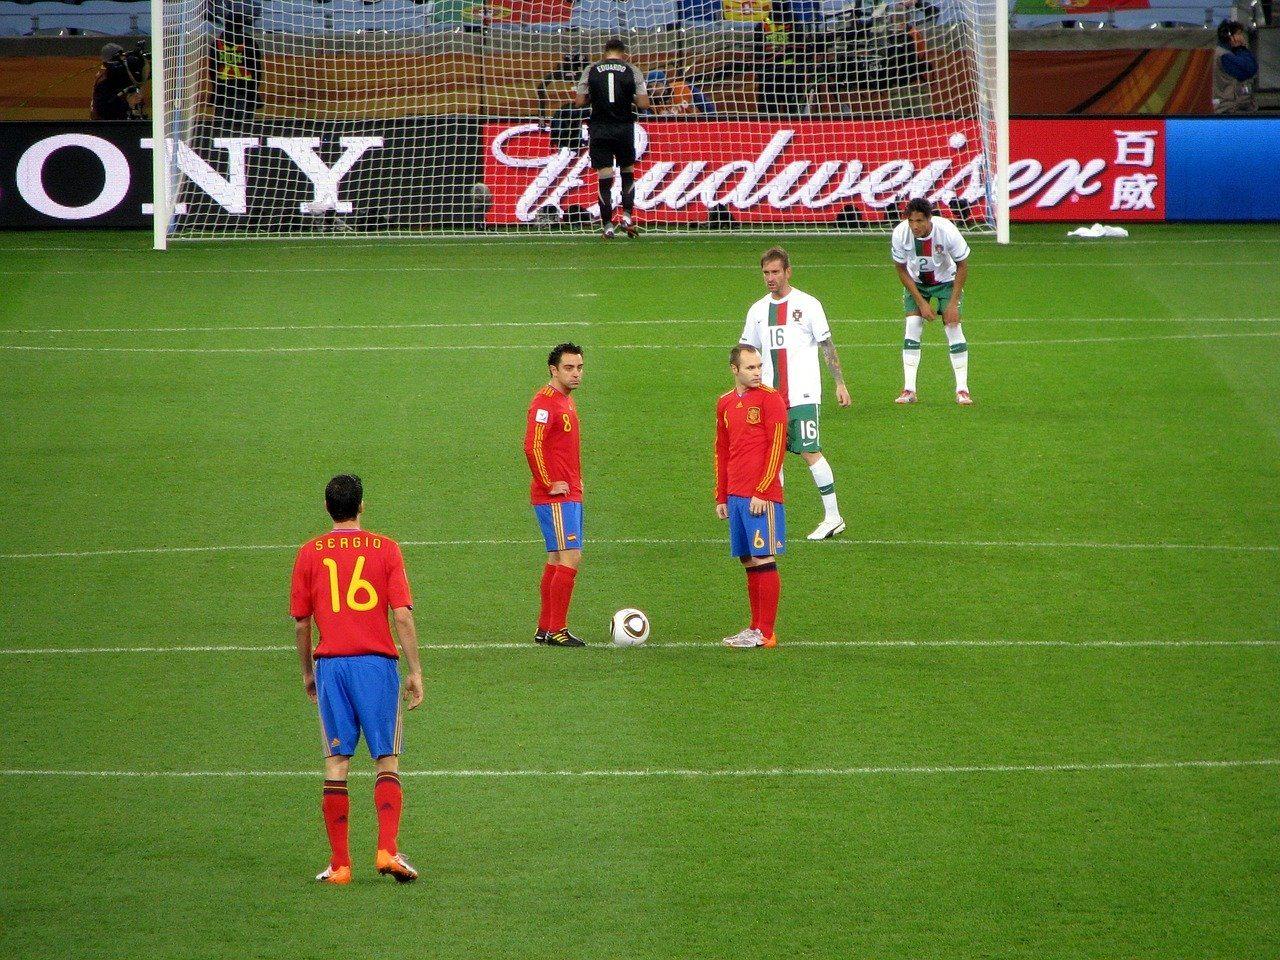 spanischer Fußball, Weltmeisterschaft 2010